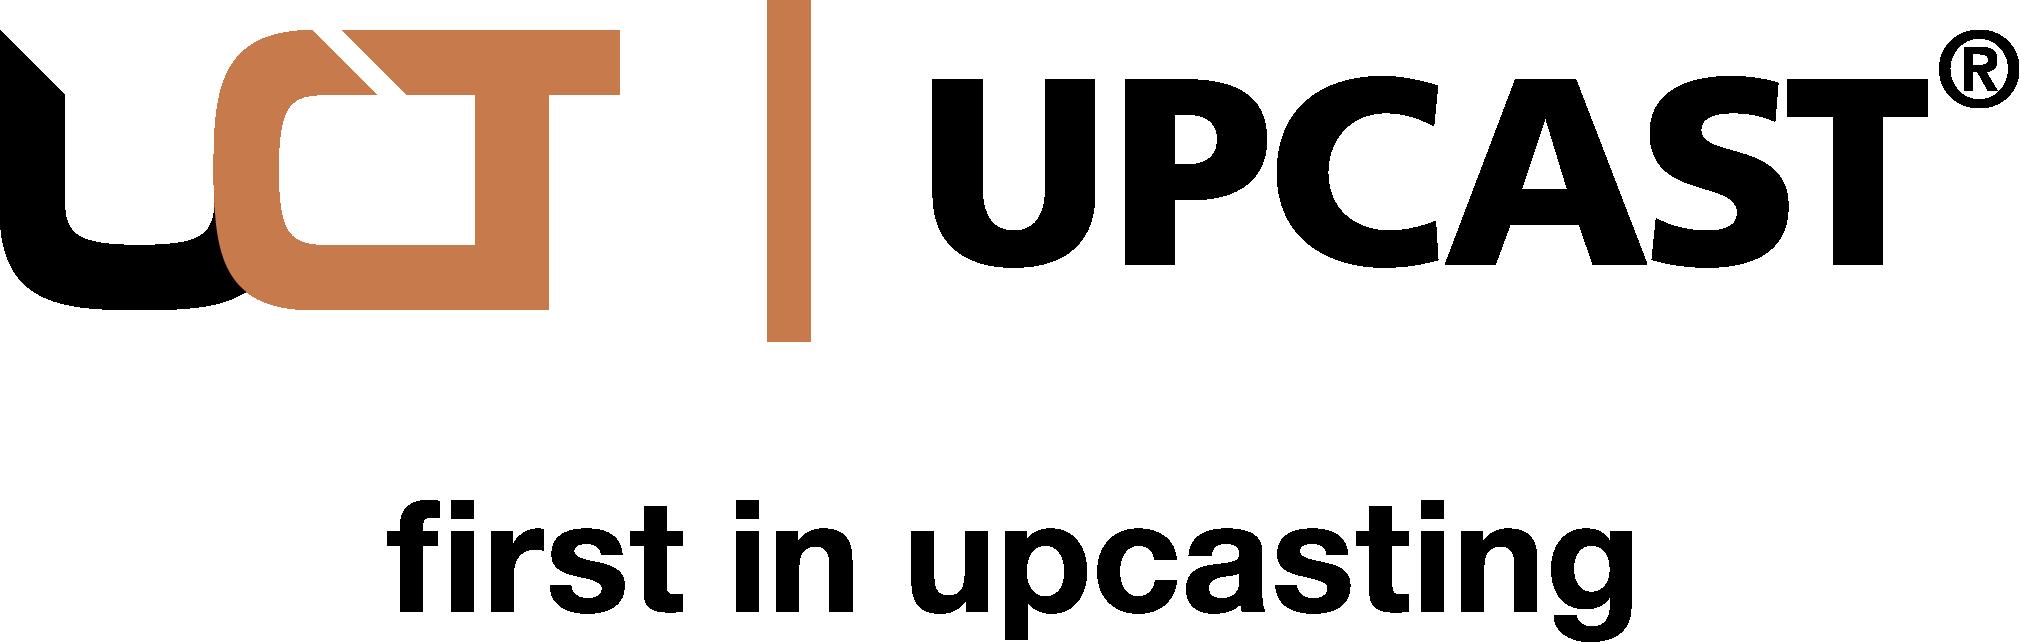 logo: Upcast Oy